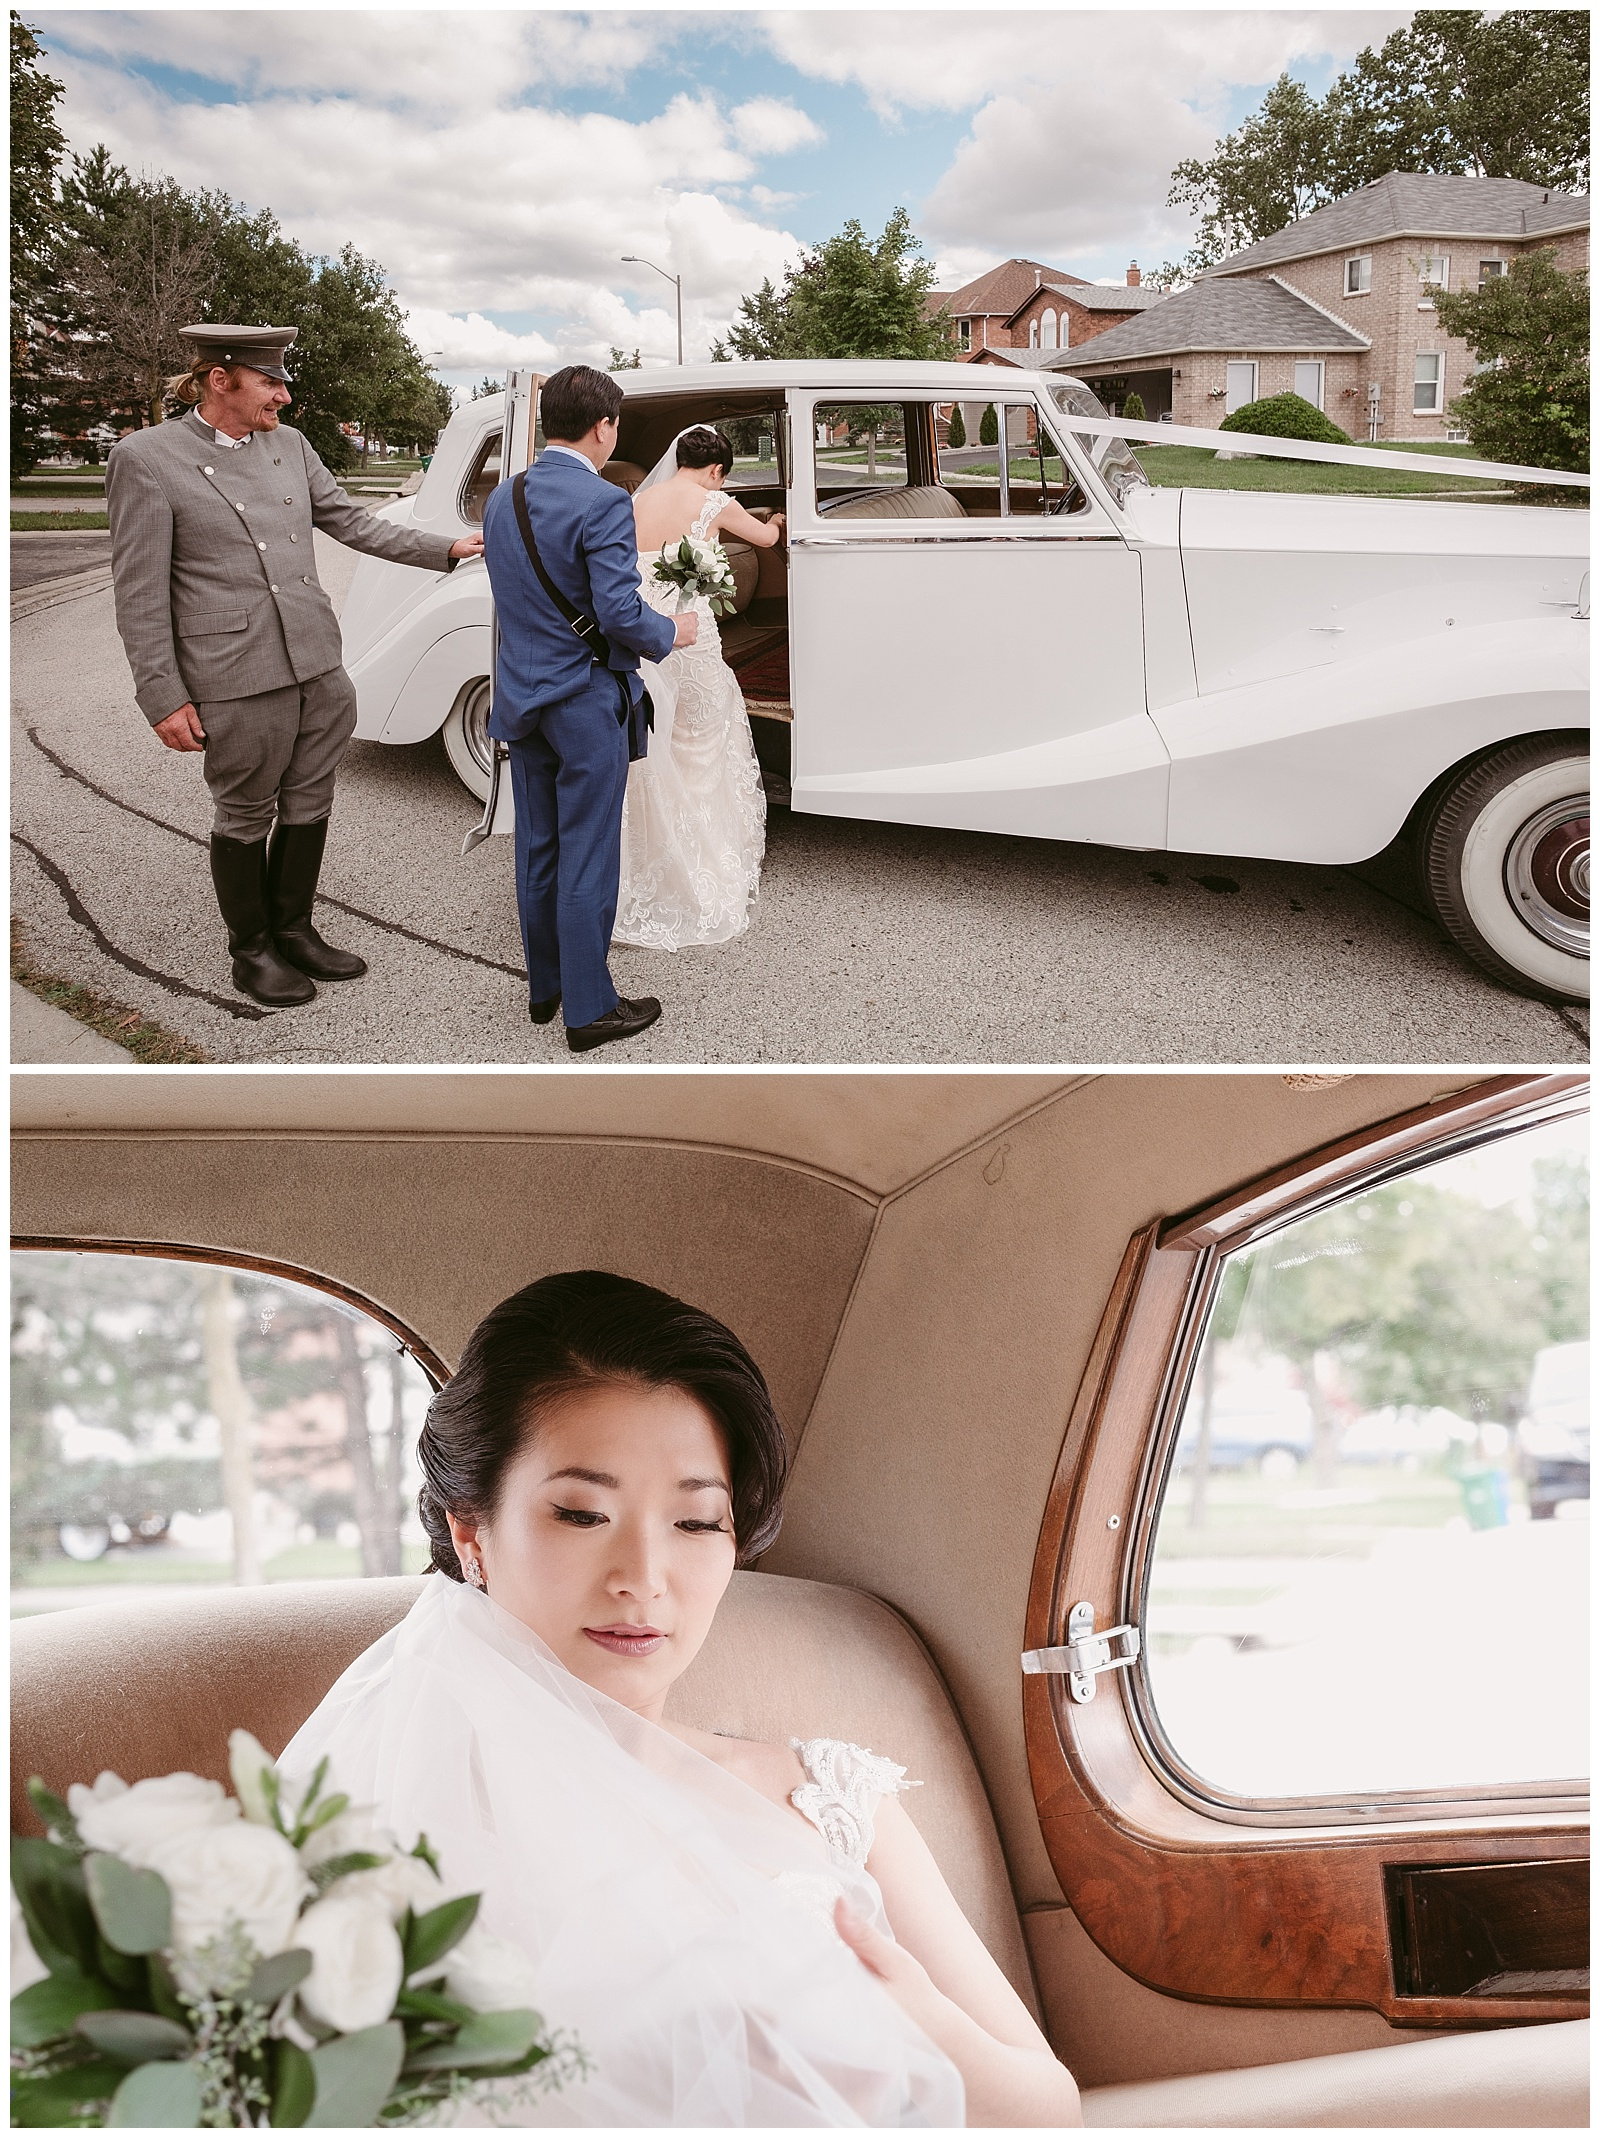 destination wedding photographer+canada+popcornphotography_0032.jpg